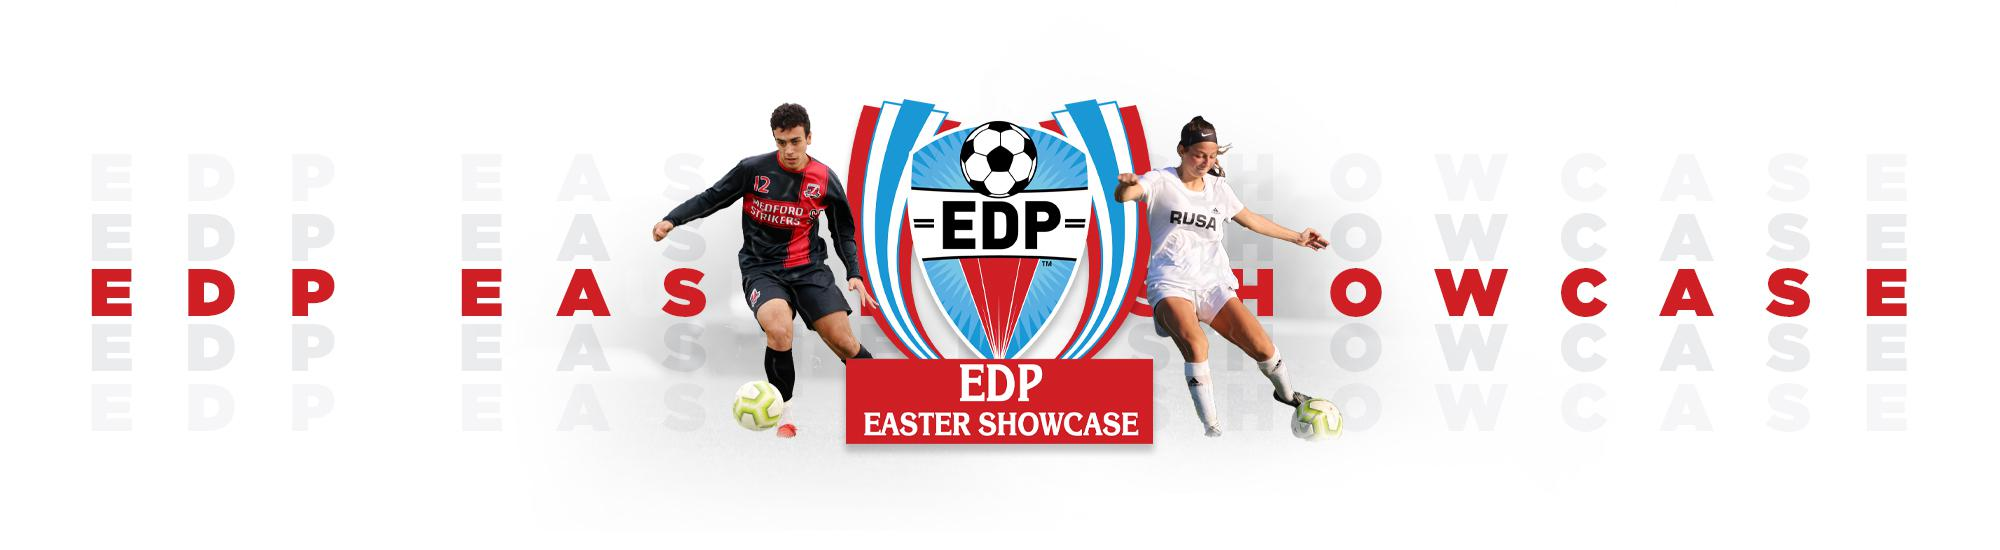 EDP Easter Showcase